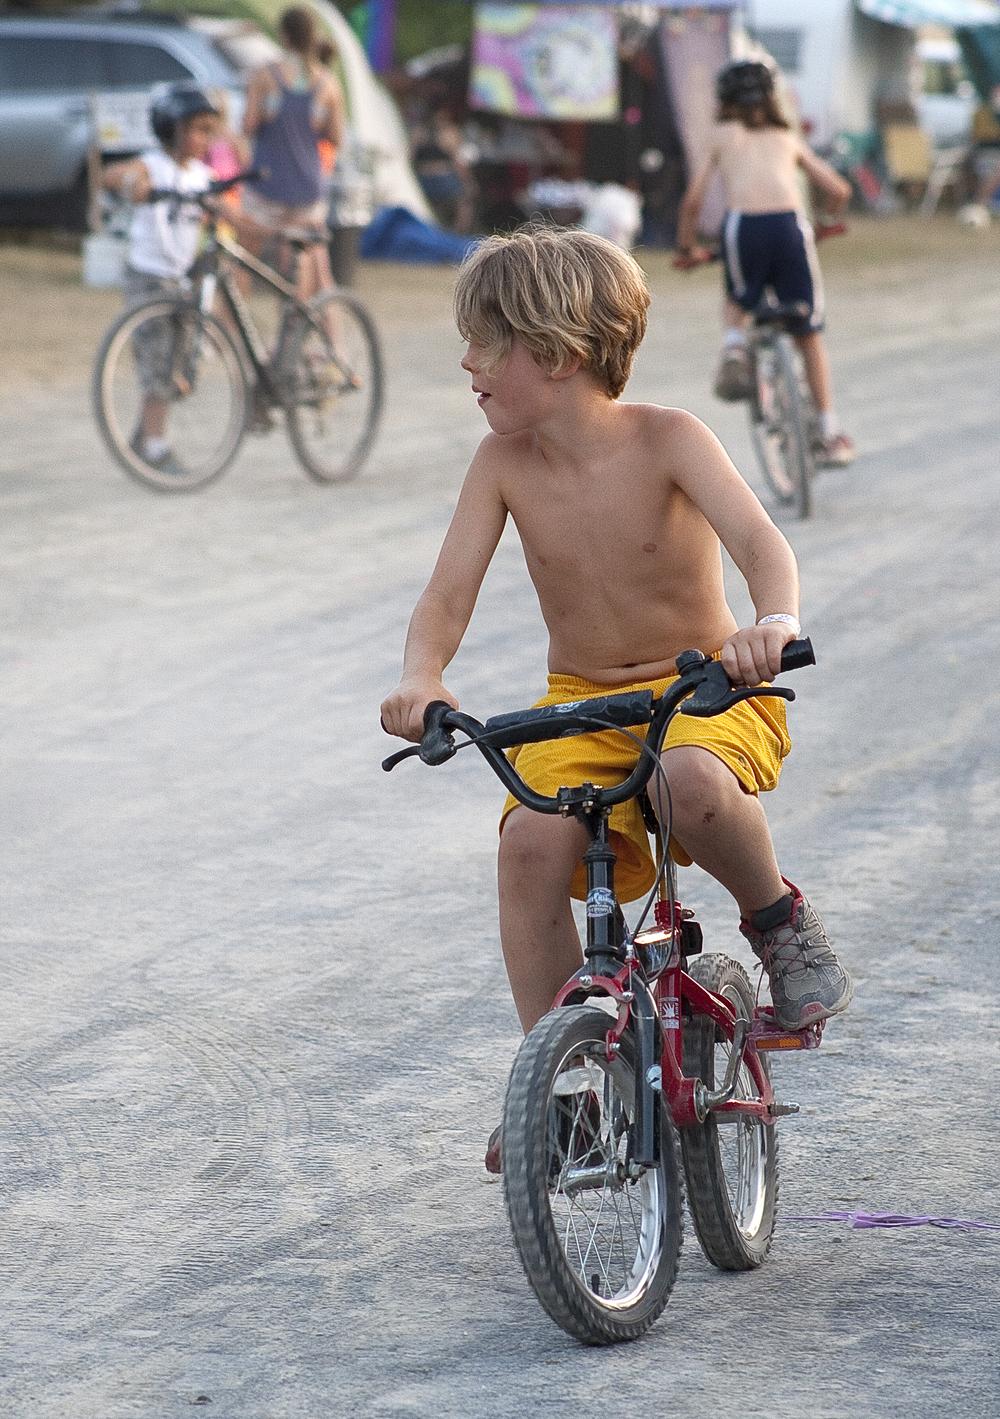 MPerkins_Grassroots2016_BicycleKids_002.jpg